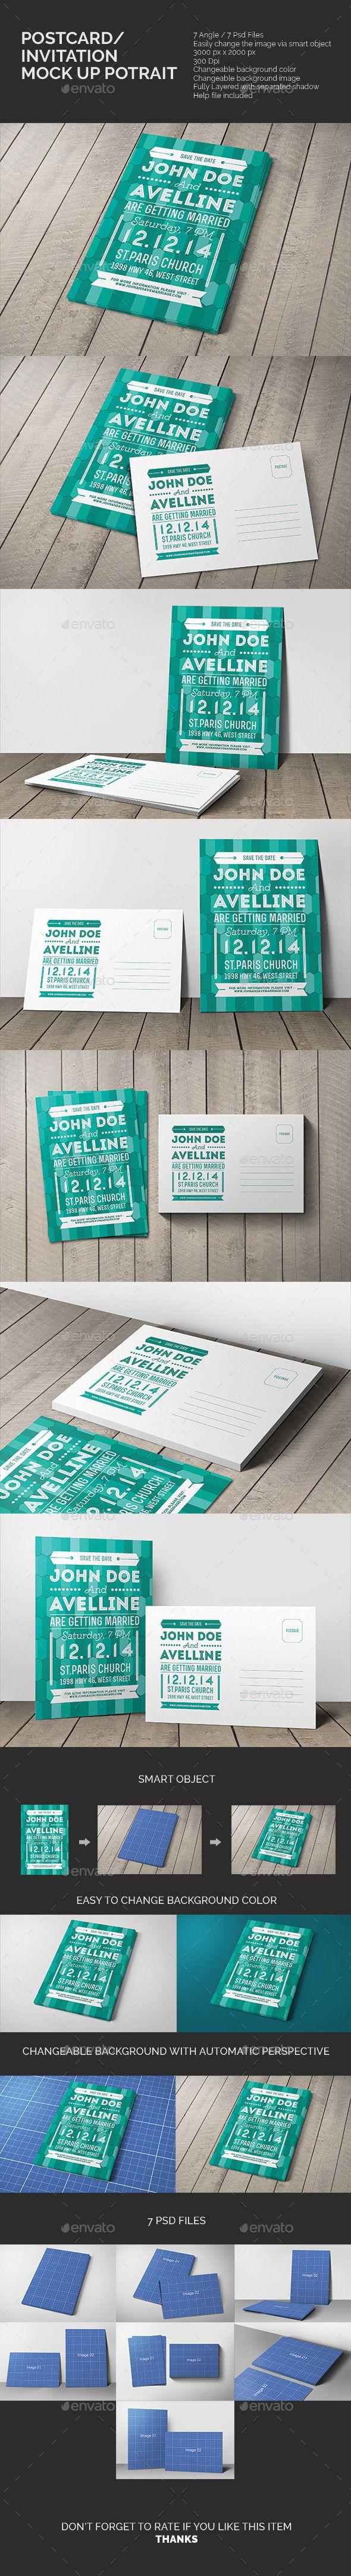 Postcard & Invitation Mock-up Potrait #postcardmockup #invitationmockup Download: http://graphicriver.net/item/postcard-invitation-mockup-potrait/10484650?ref=ksioks